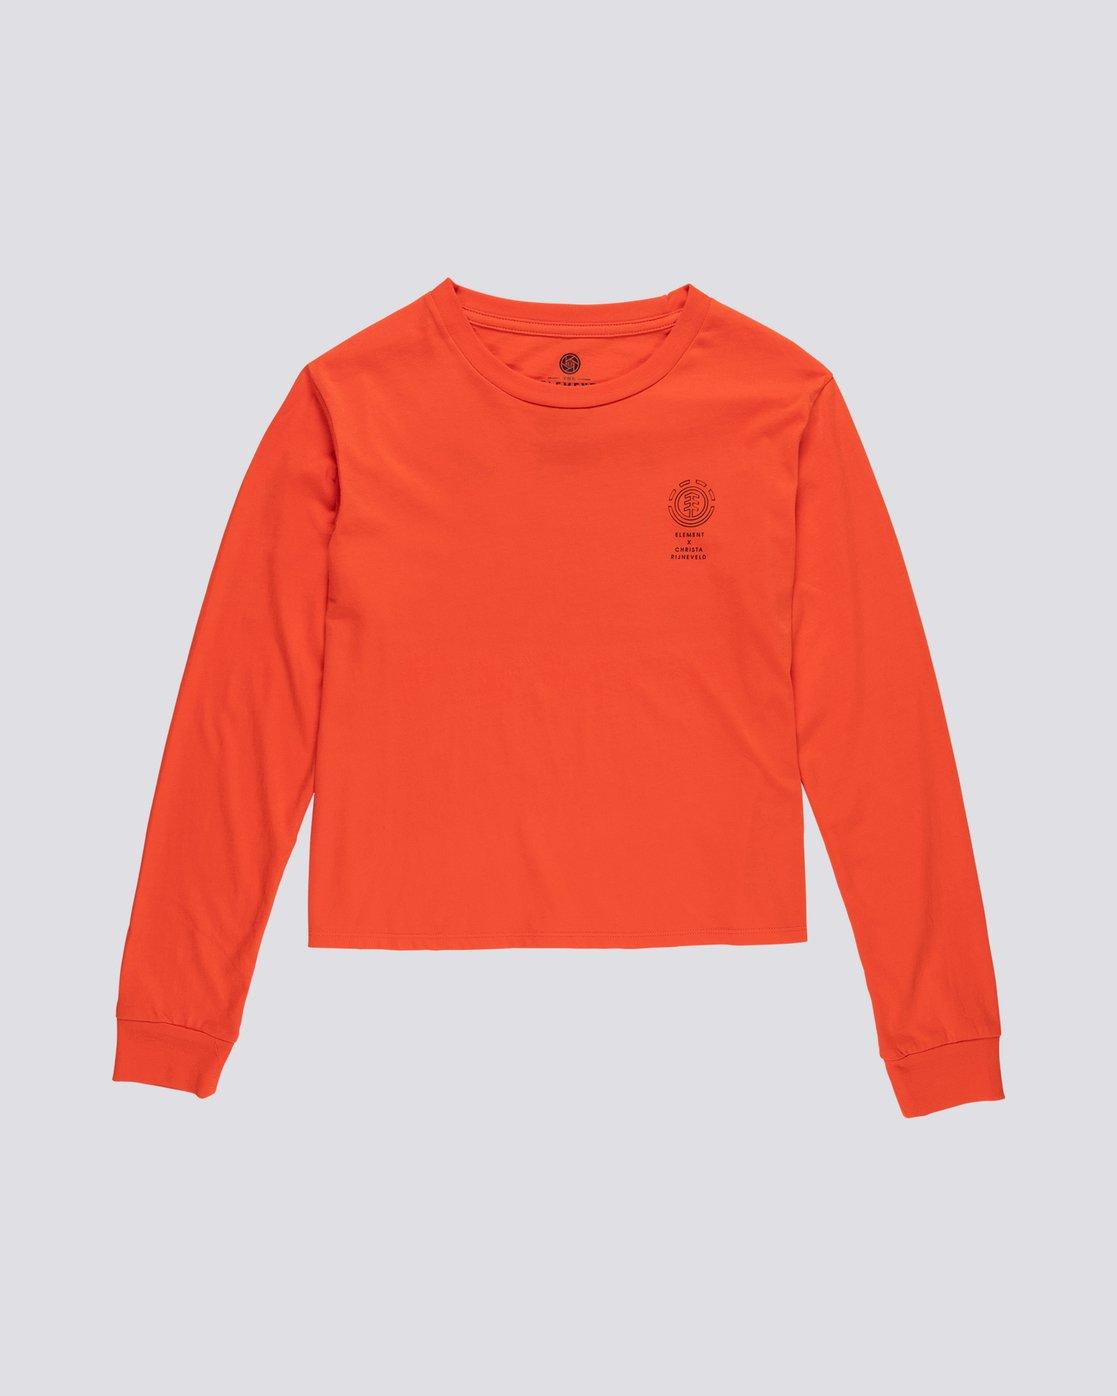 Personalised Kids ORGANIC Cotton L//S TeeShirt